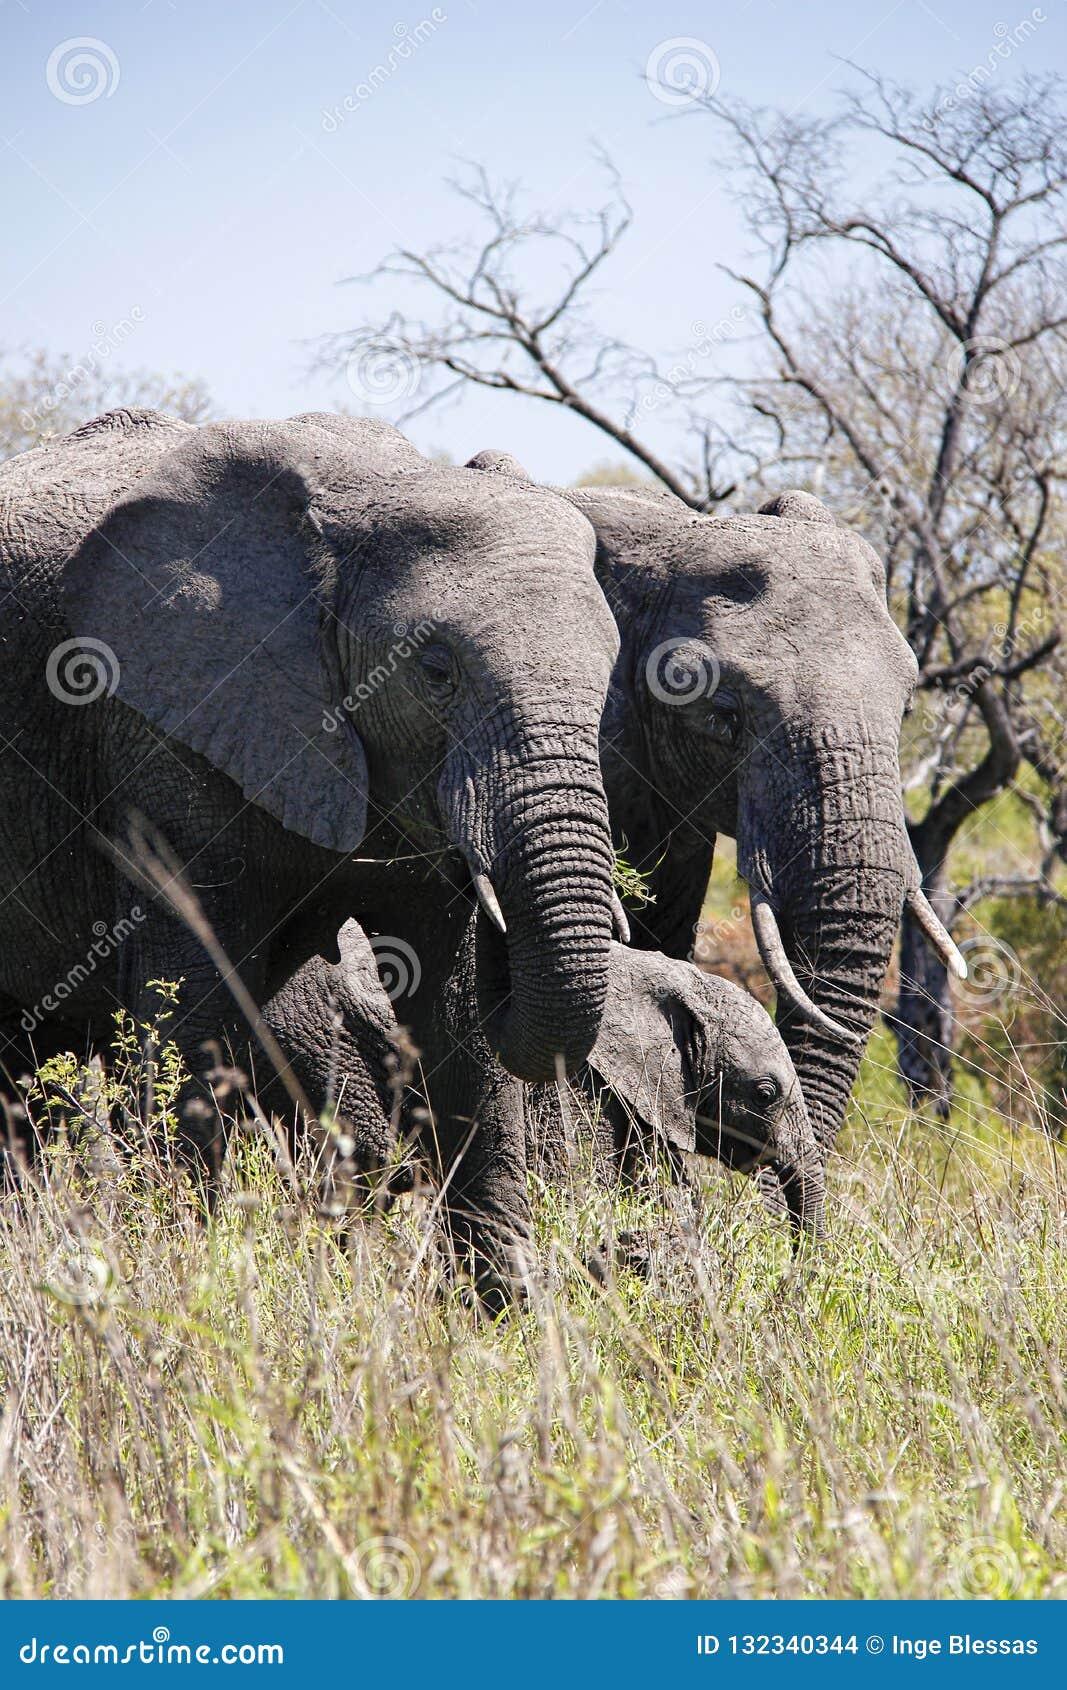 Elephant family in African bush.